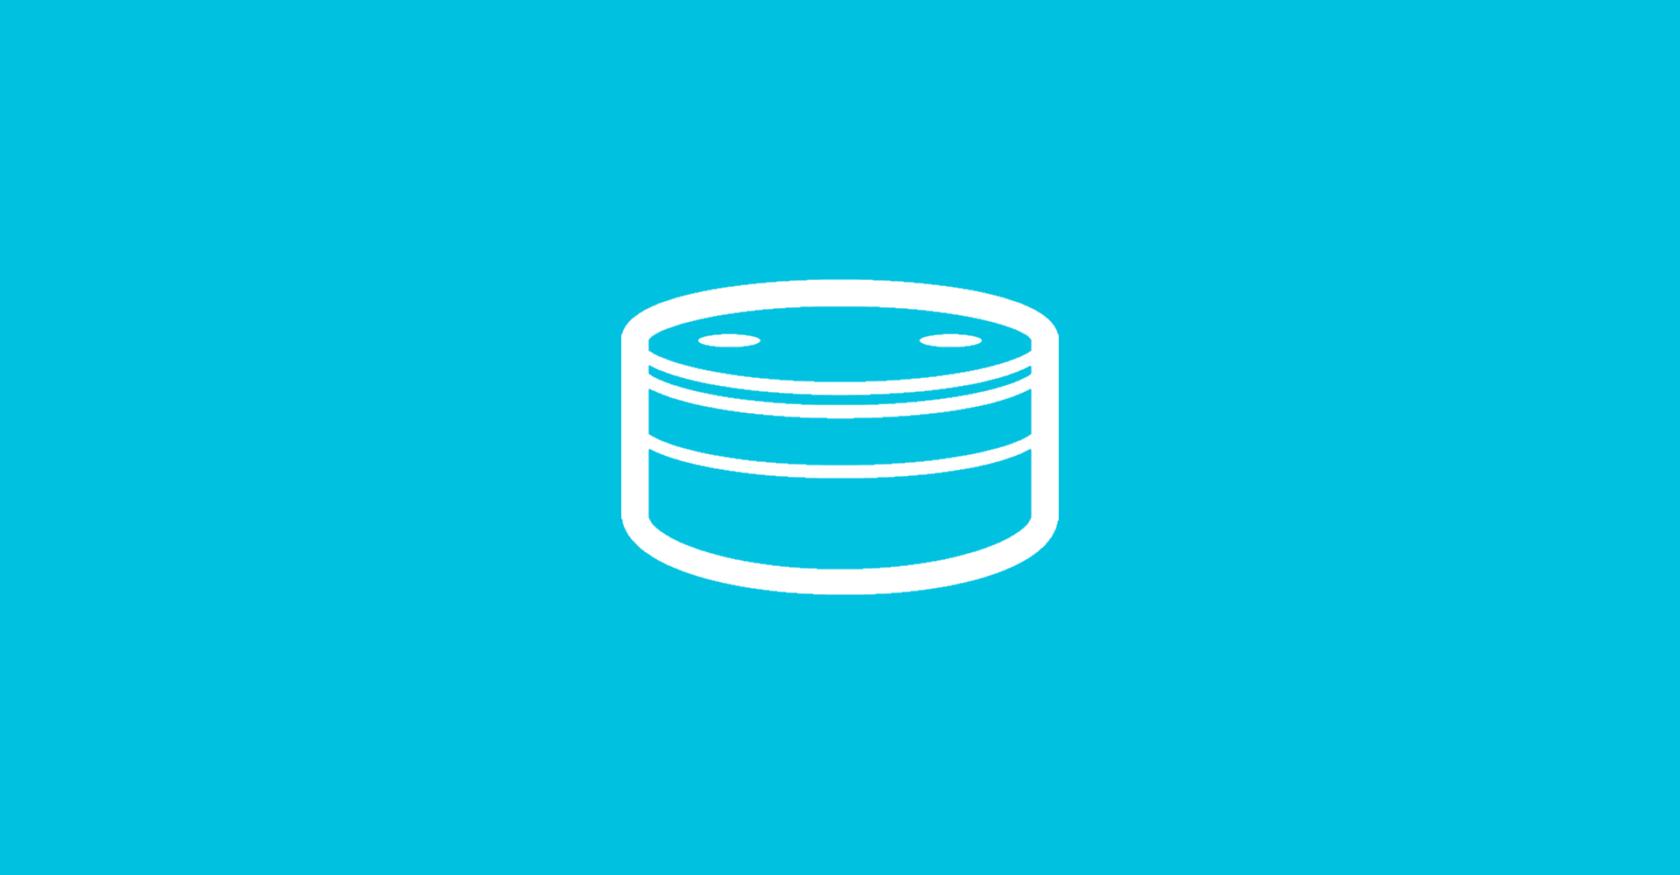 Alexa-Skill mit Storyline entwickeln